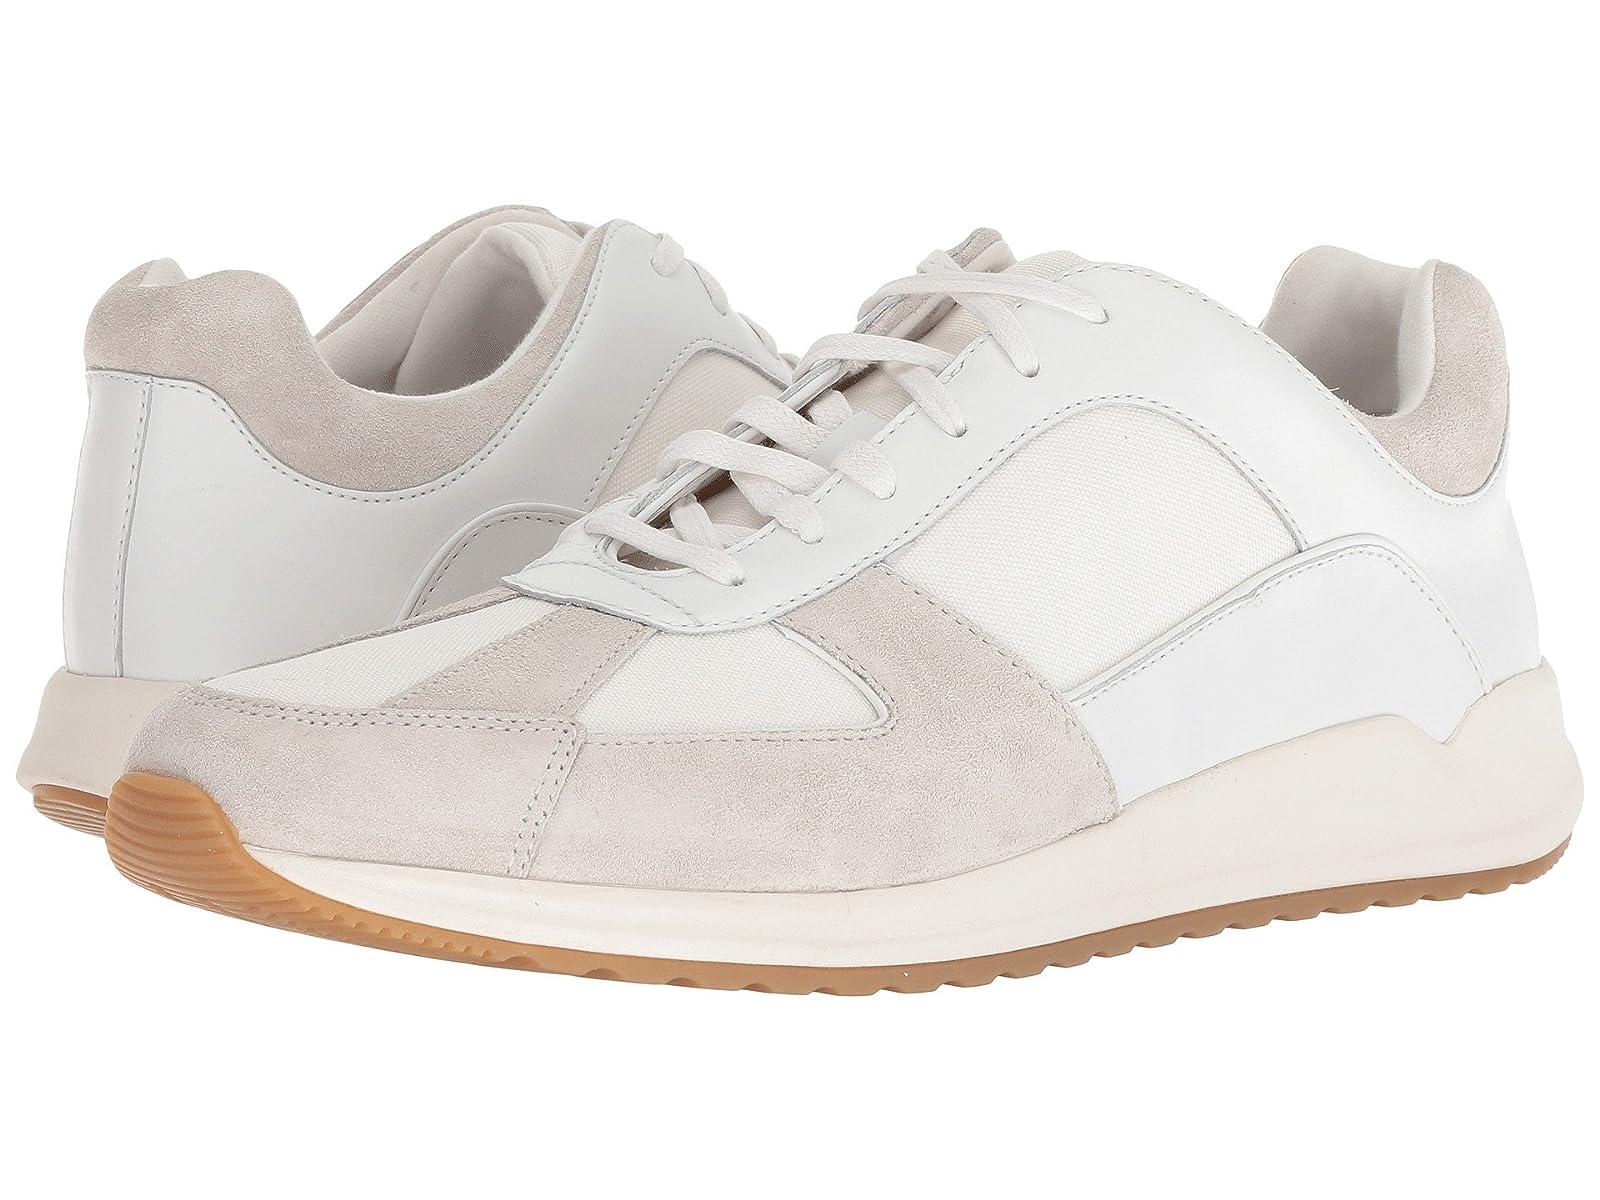 Vince GriffinAtmospheric grades have affordable shoes